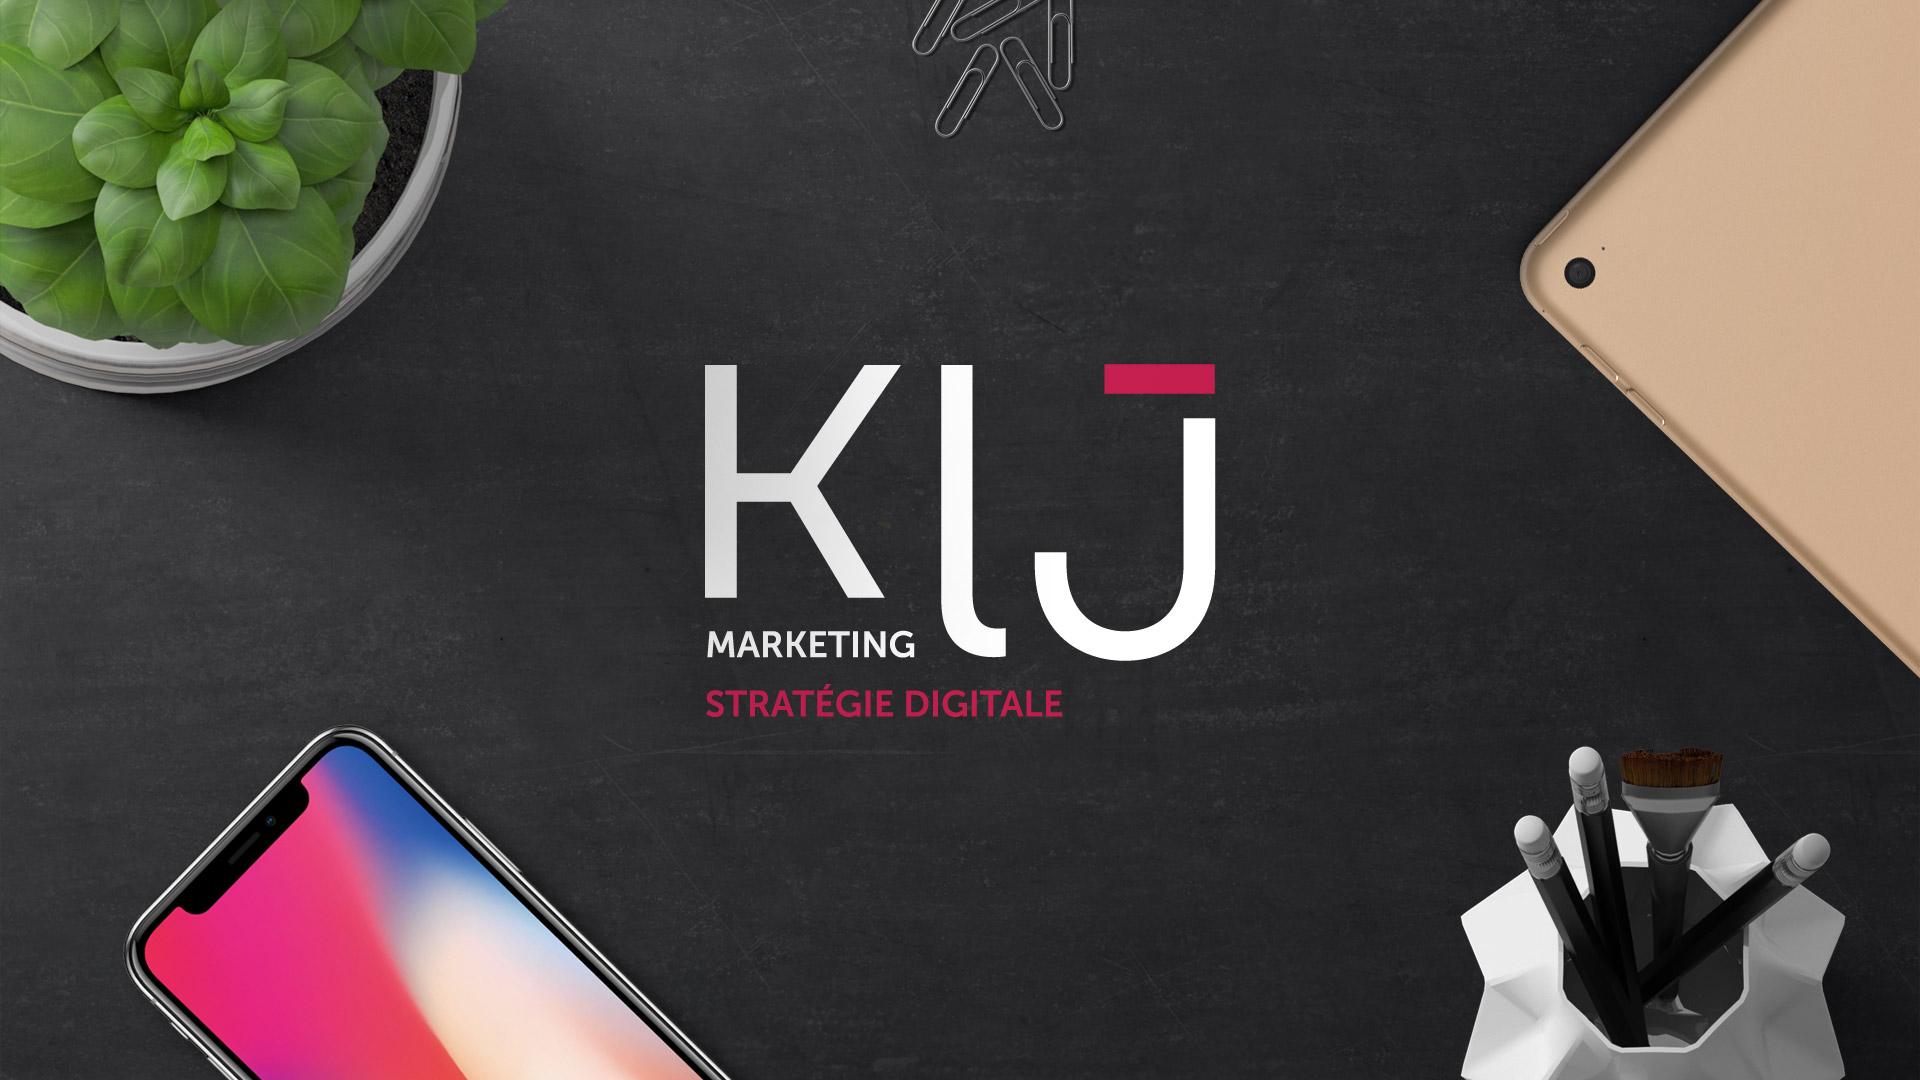 Création logo identité visuelle agence marketing stratégie digitale Montpellier KLJ